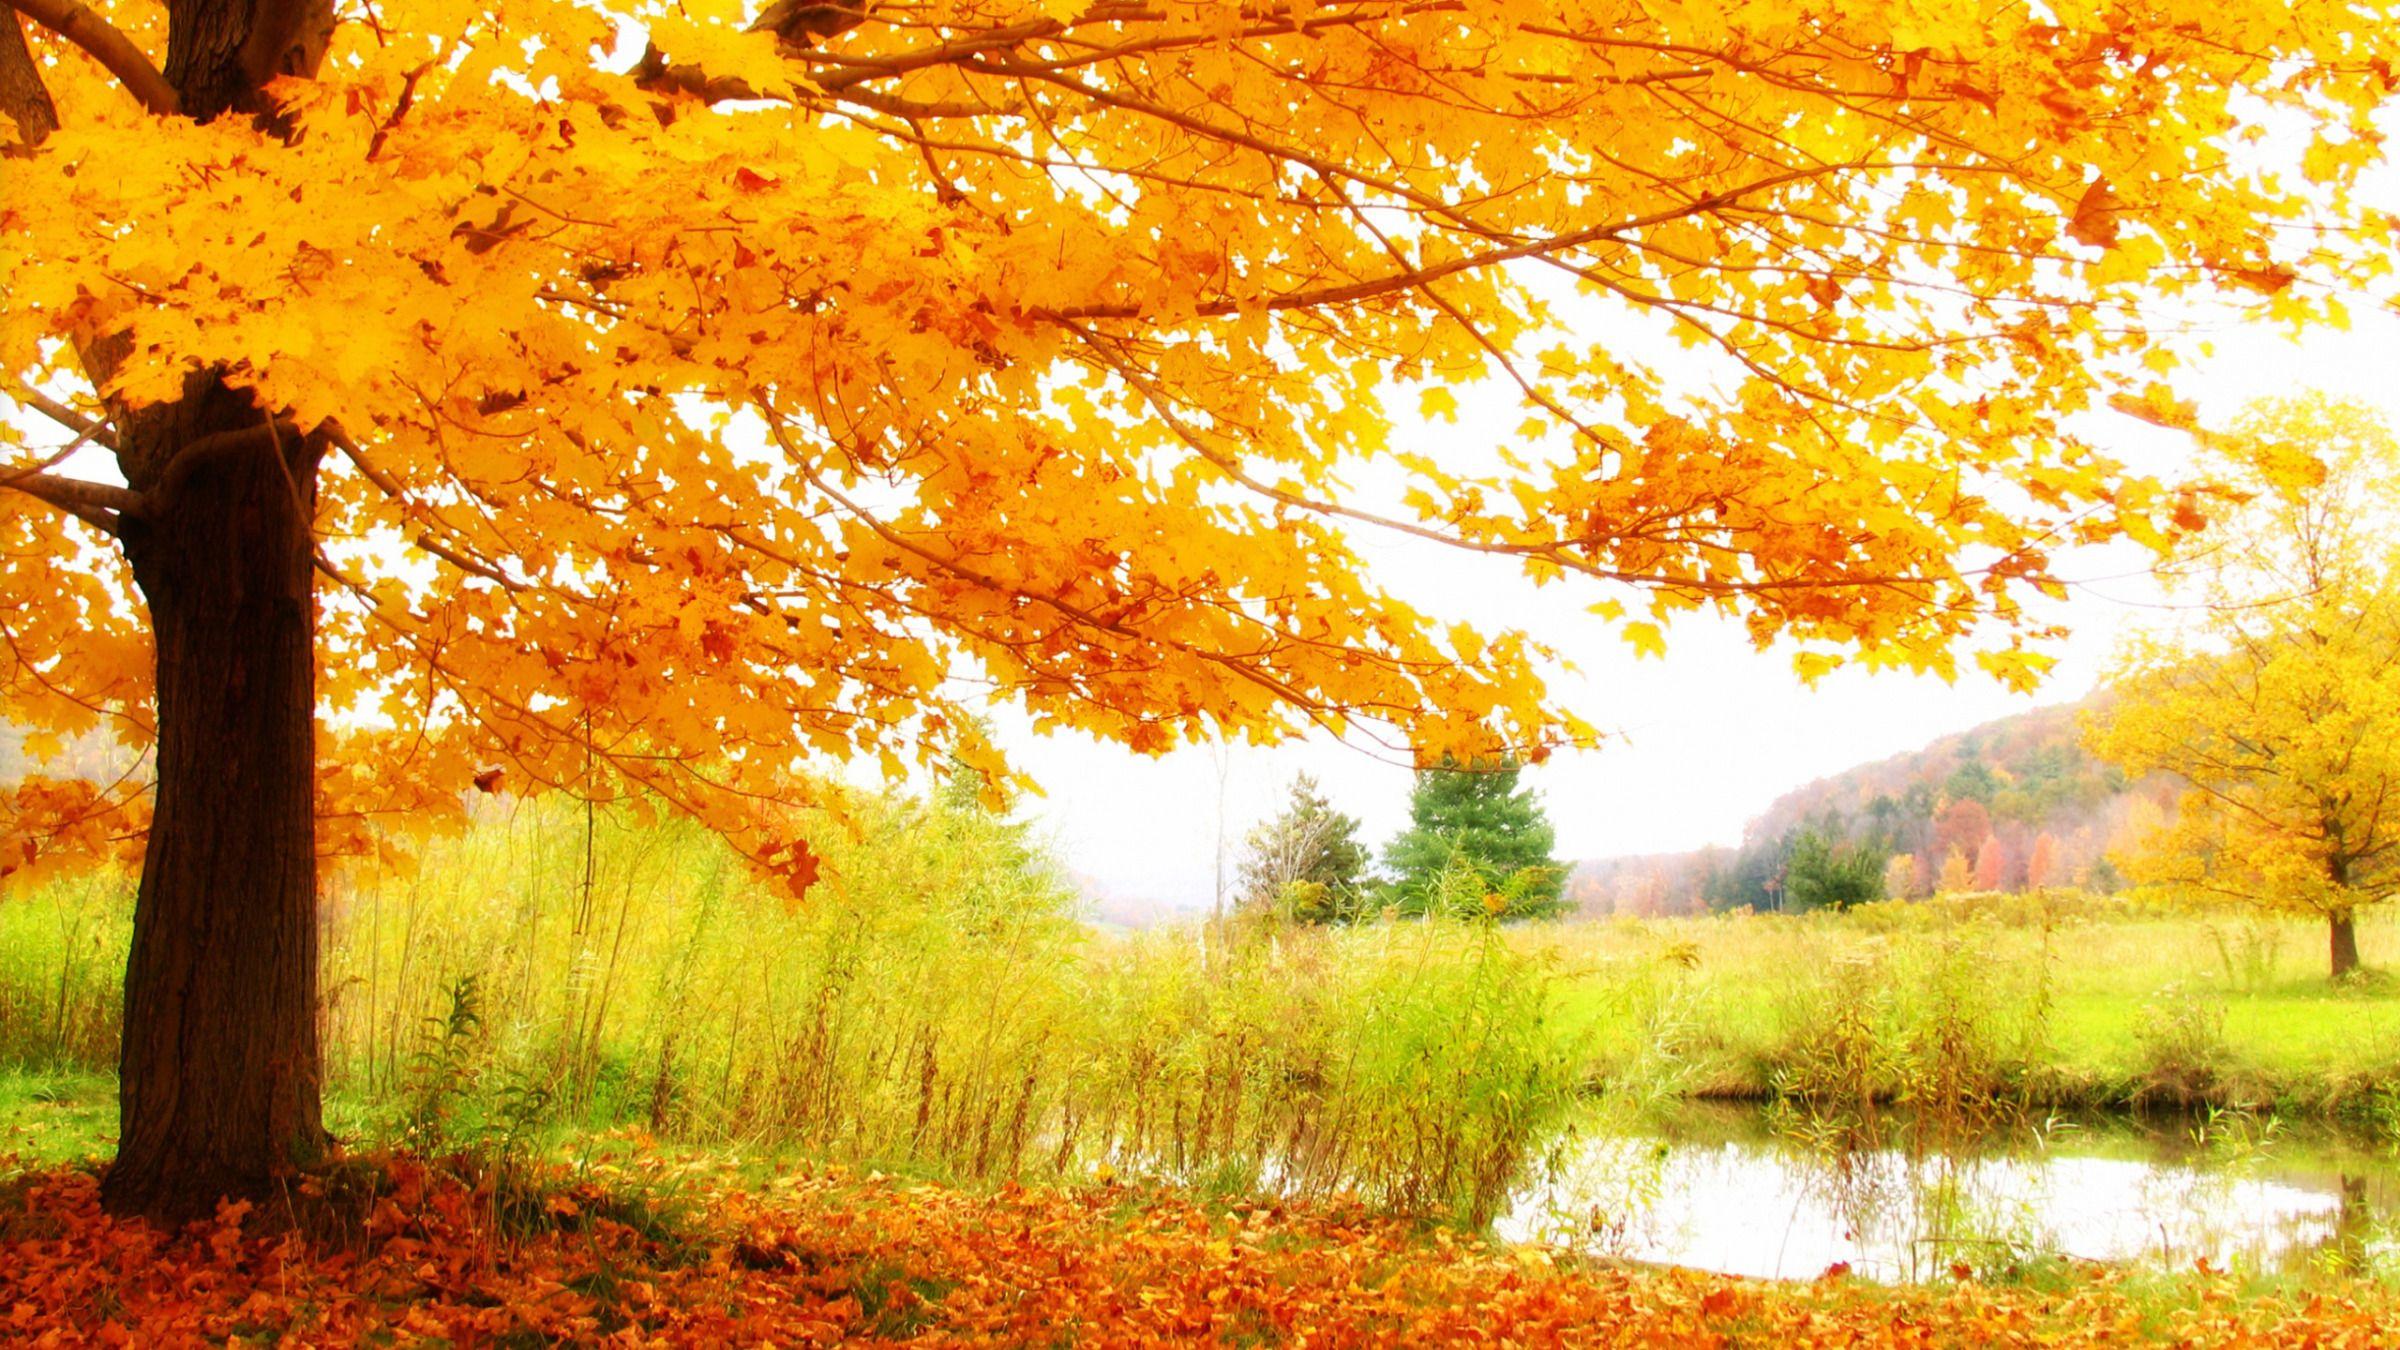 Garden Design Garden Design With Landscape Fall Hd Wallpapera Scenery Wallpaper Autumn Scenery Scenery Pictures